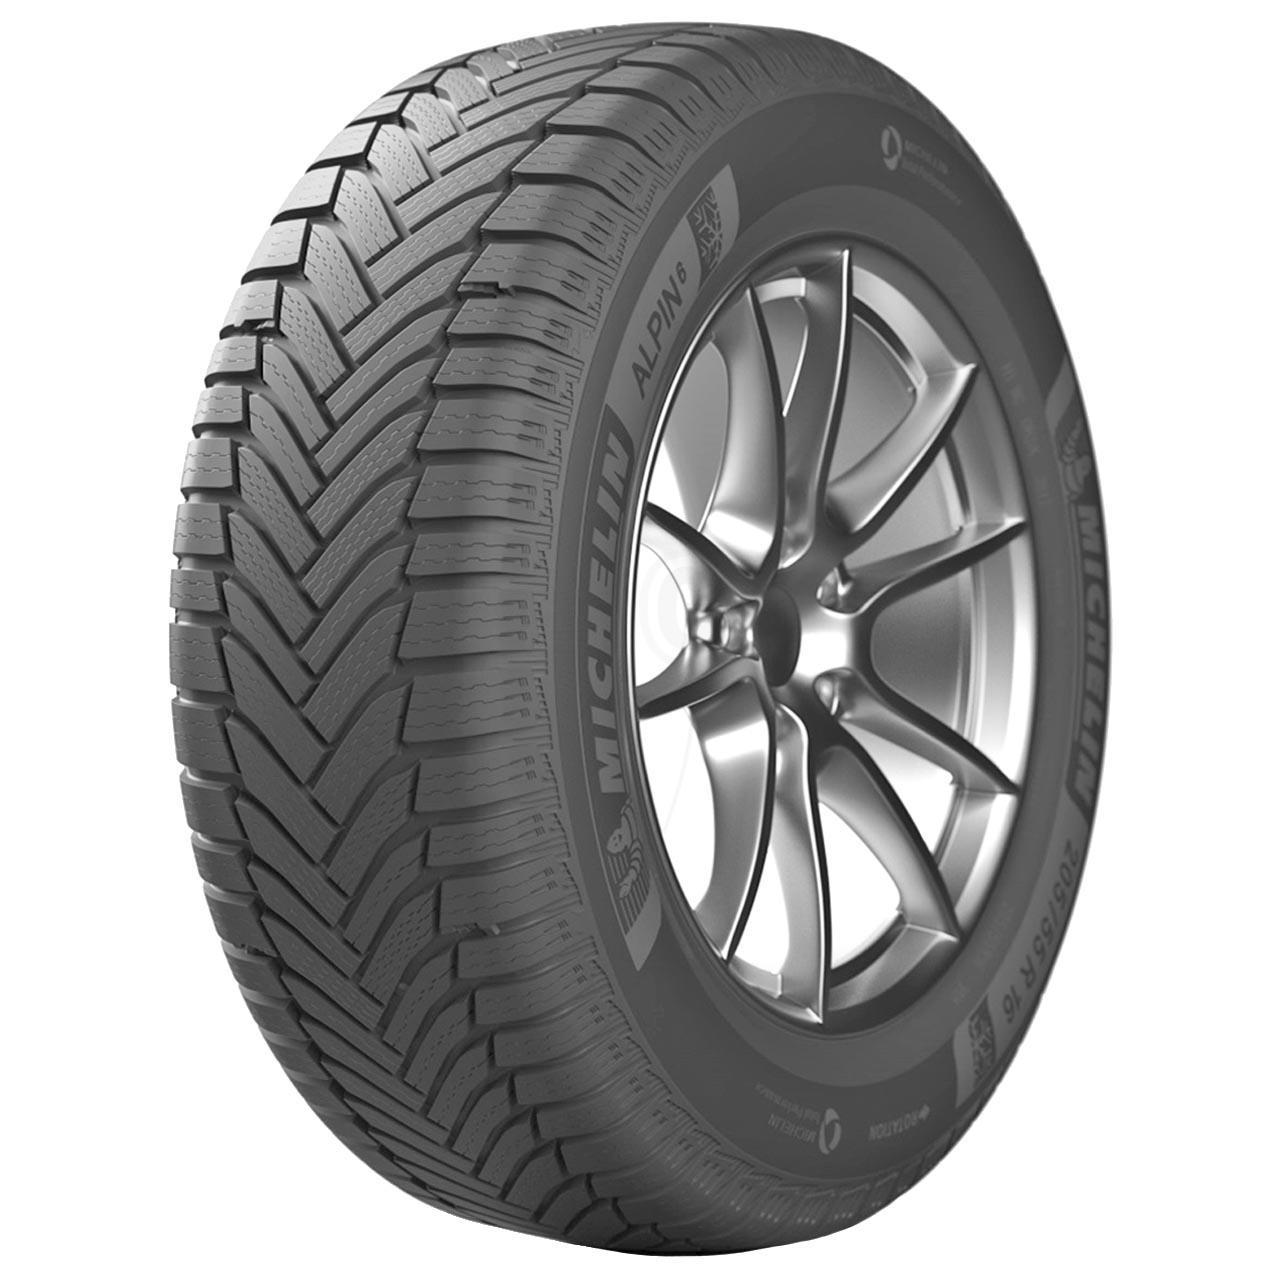 Michelin Alpin 6 205/55R16 94H XL